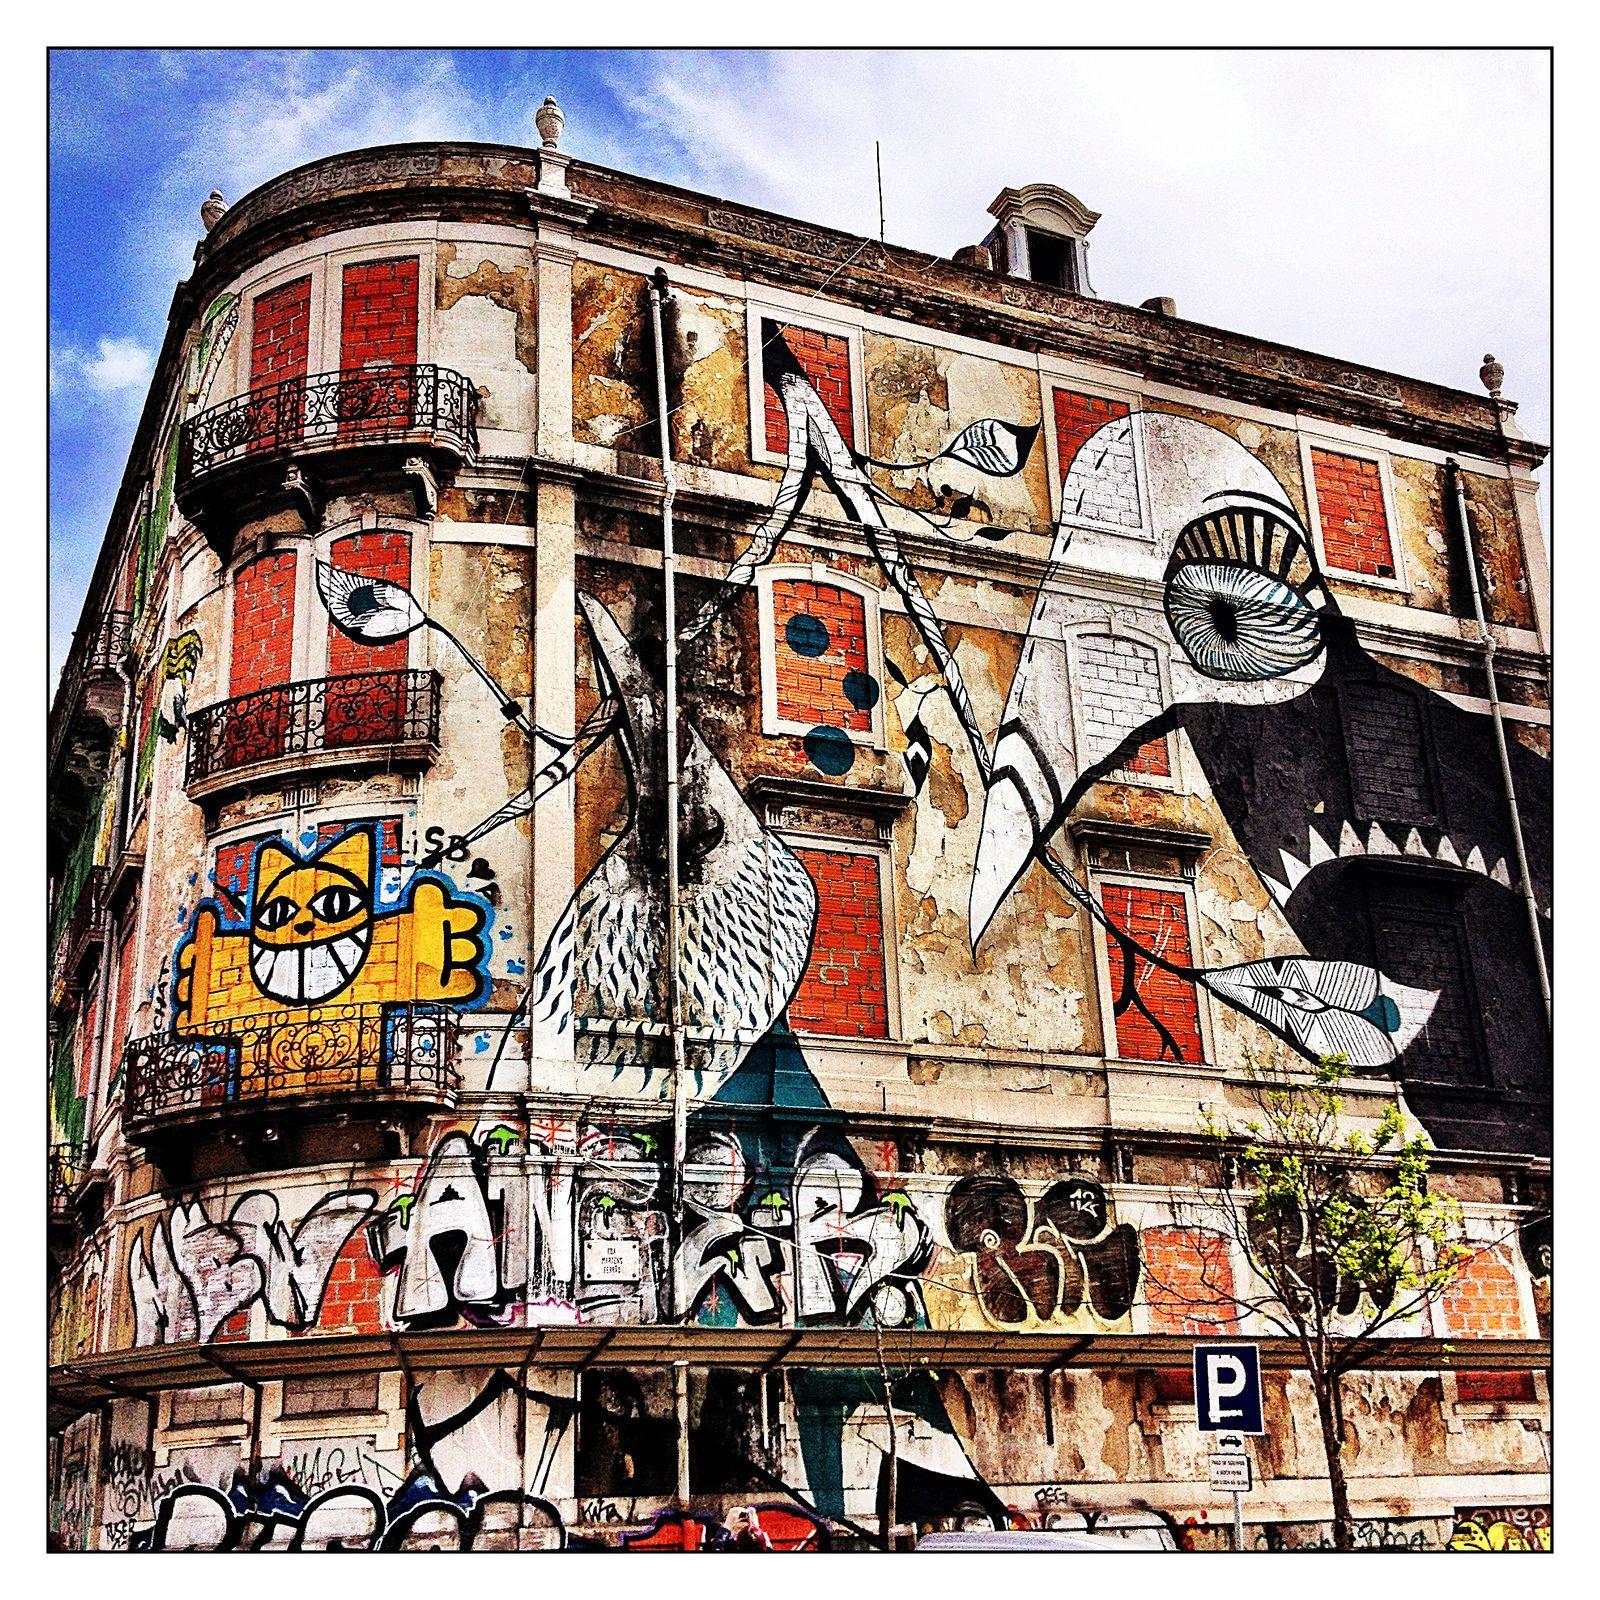 Lisbon | iPhone4S | Richard | Flickr